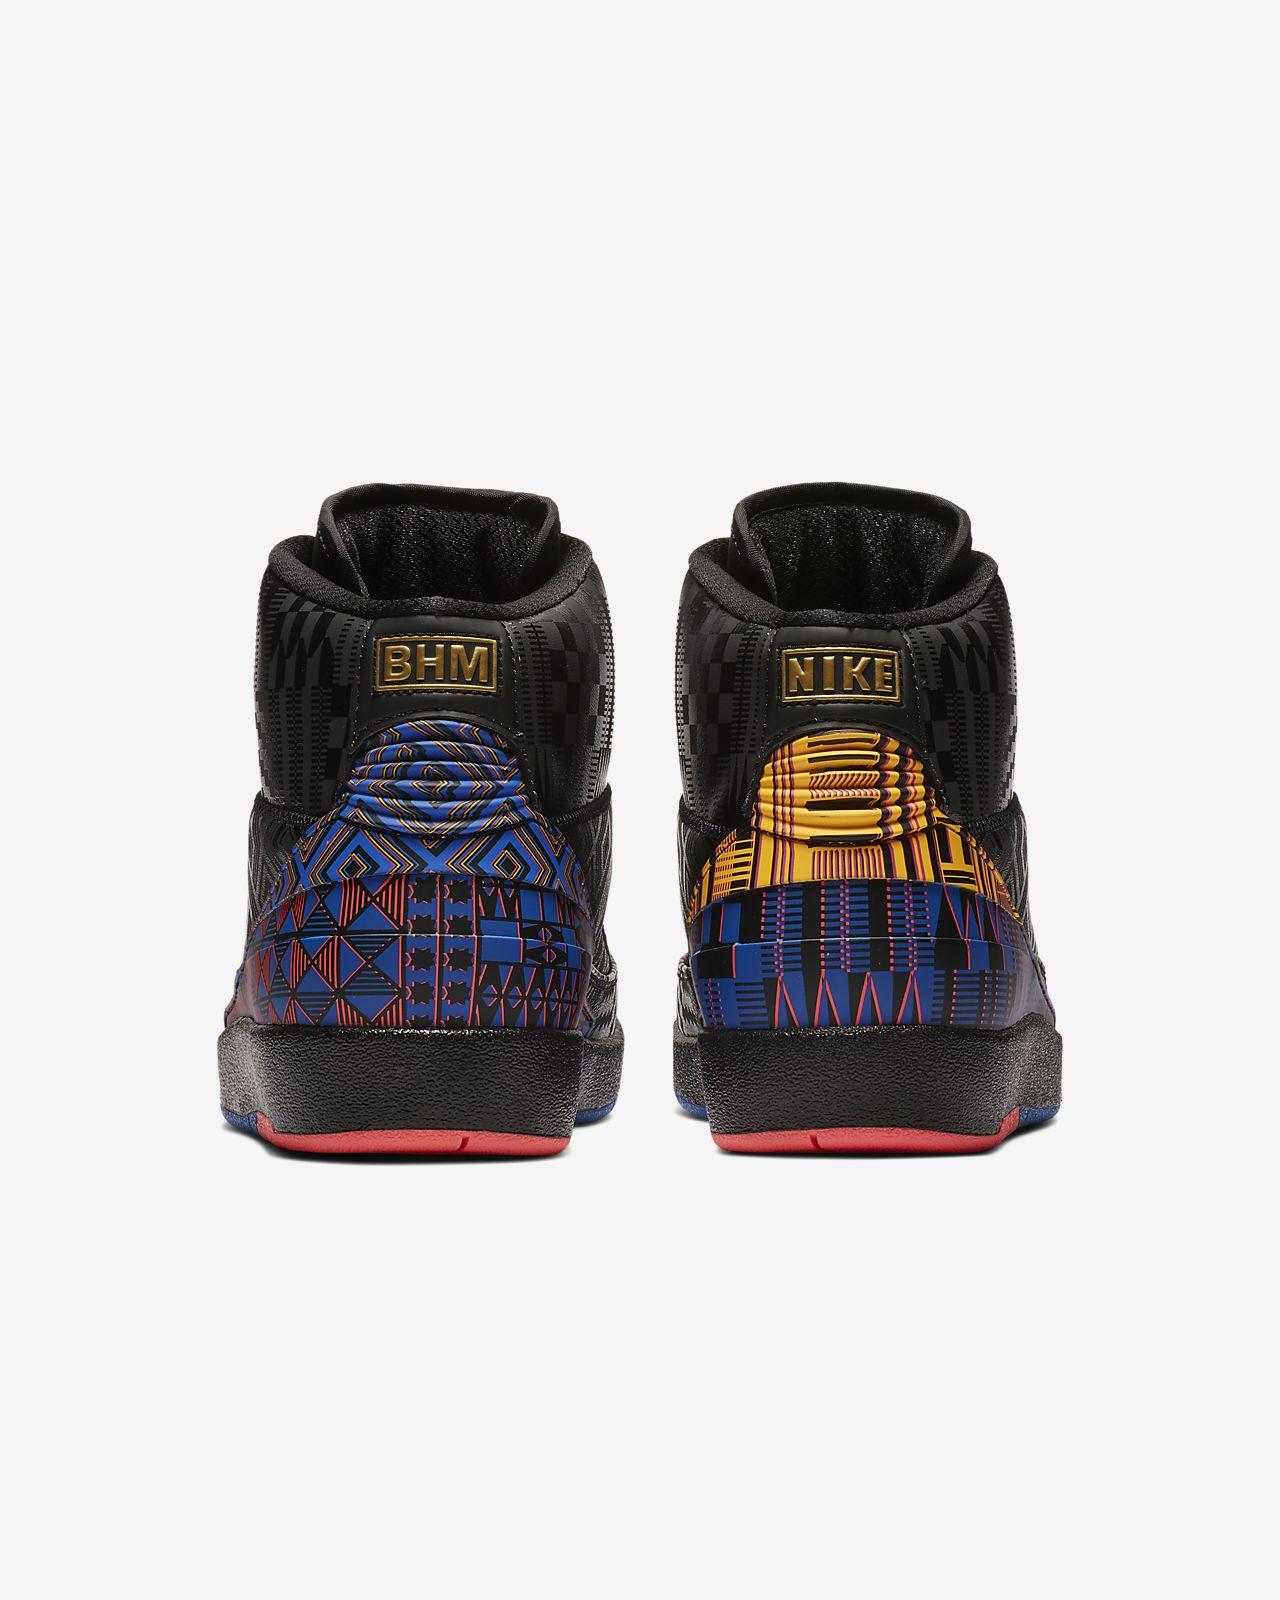 884abd51fc4 Air Jordan 2 Retro BHM Men s Shoe. Nike.com